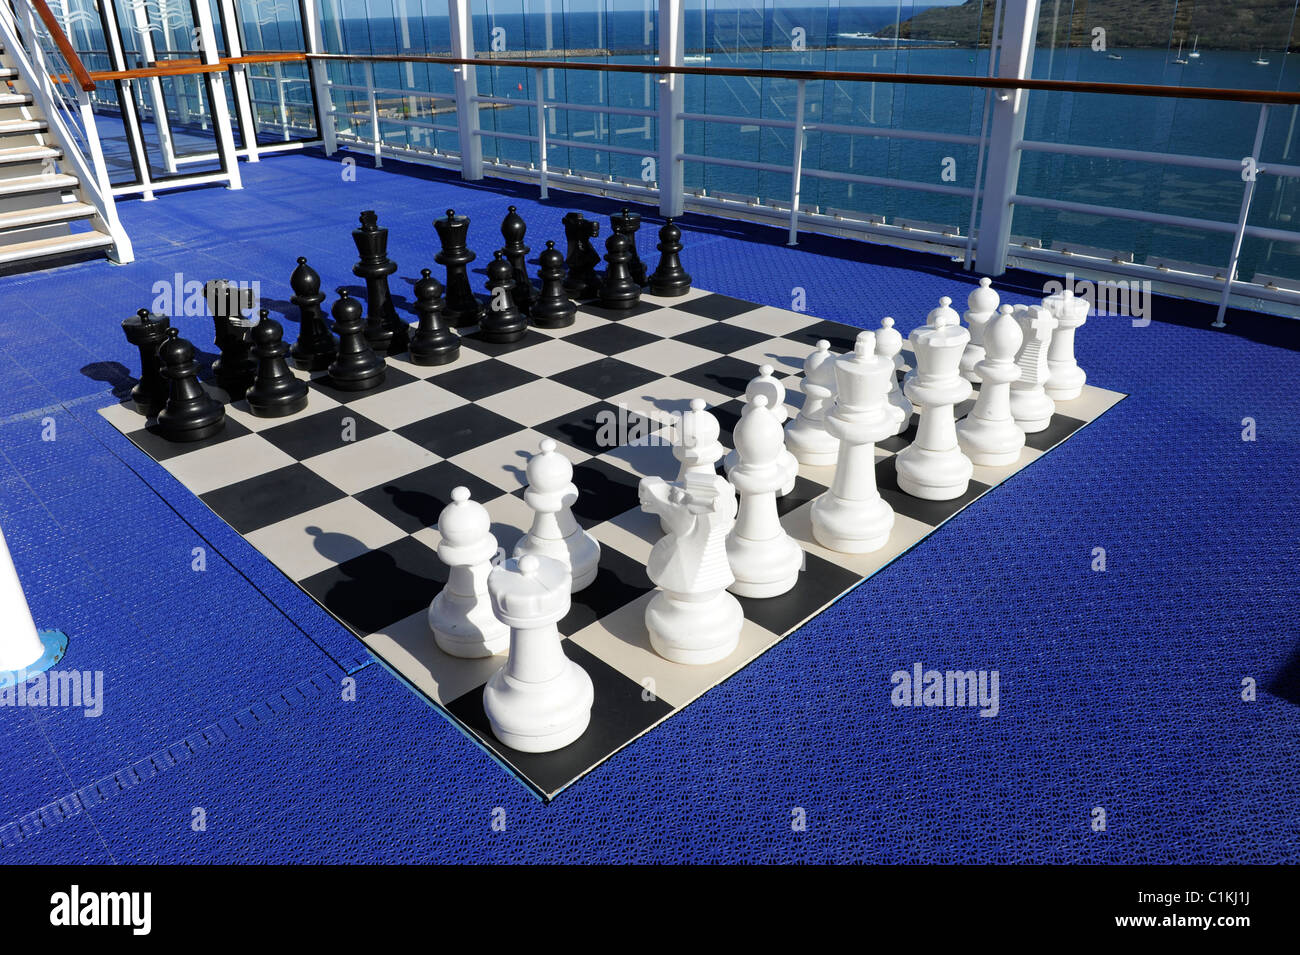 Ms pride of america norwegian cruise line - Large Chess Board Norwegian Cruise Line Pride Of America Ship Hawaii Stock Image